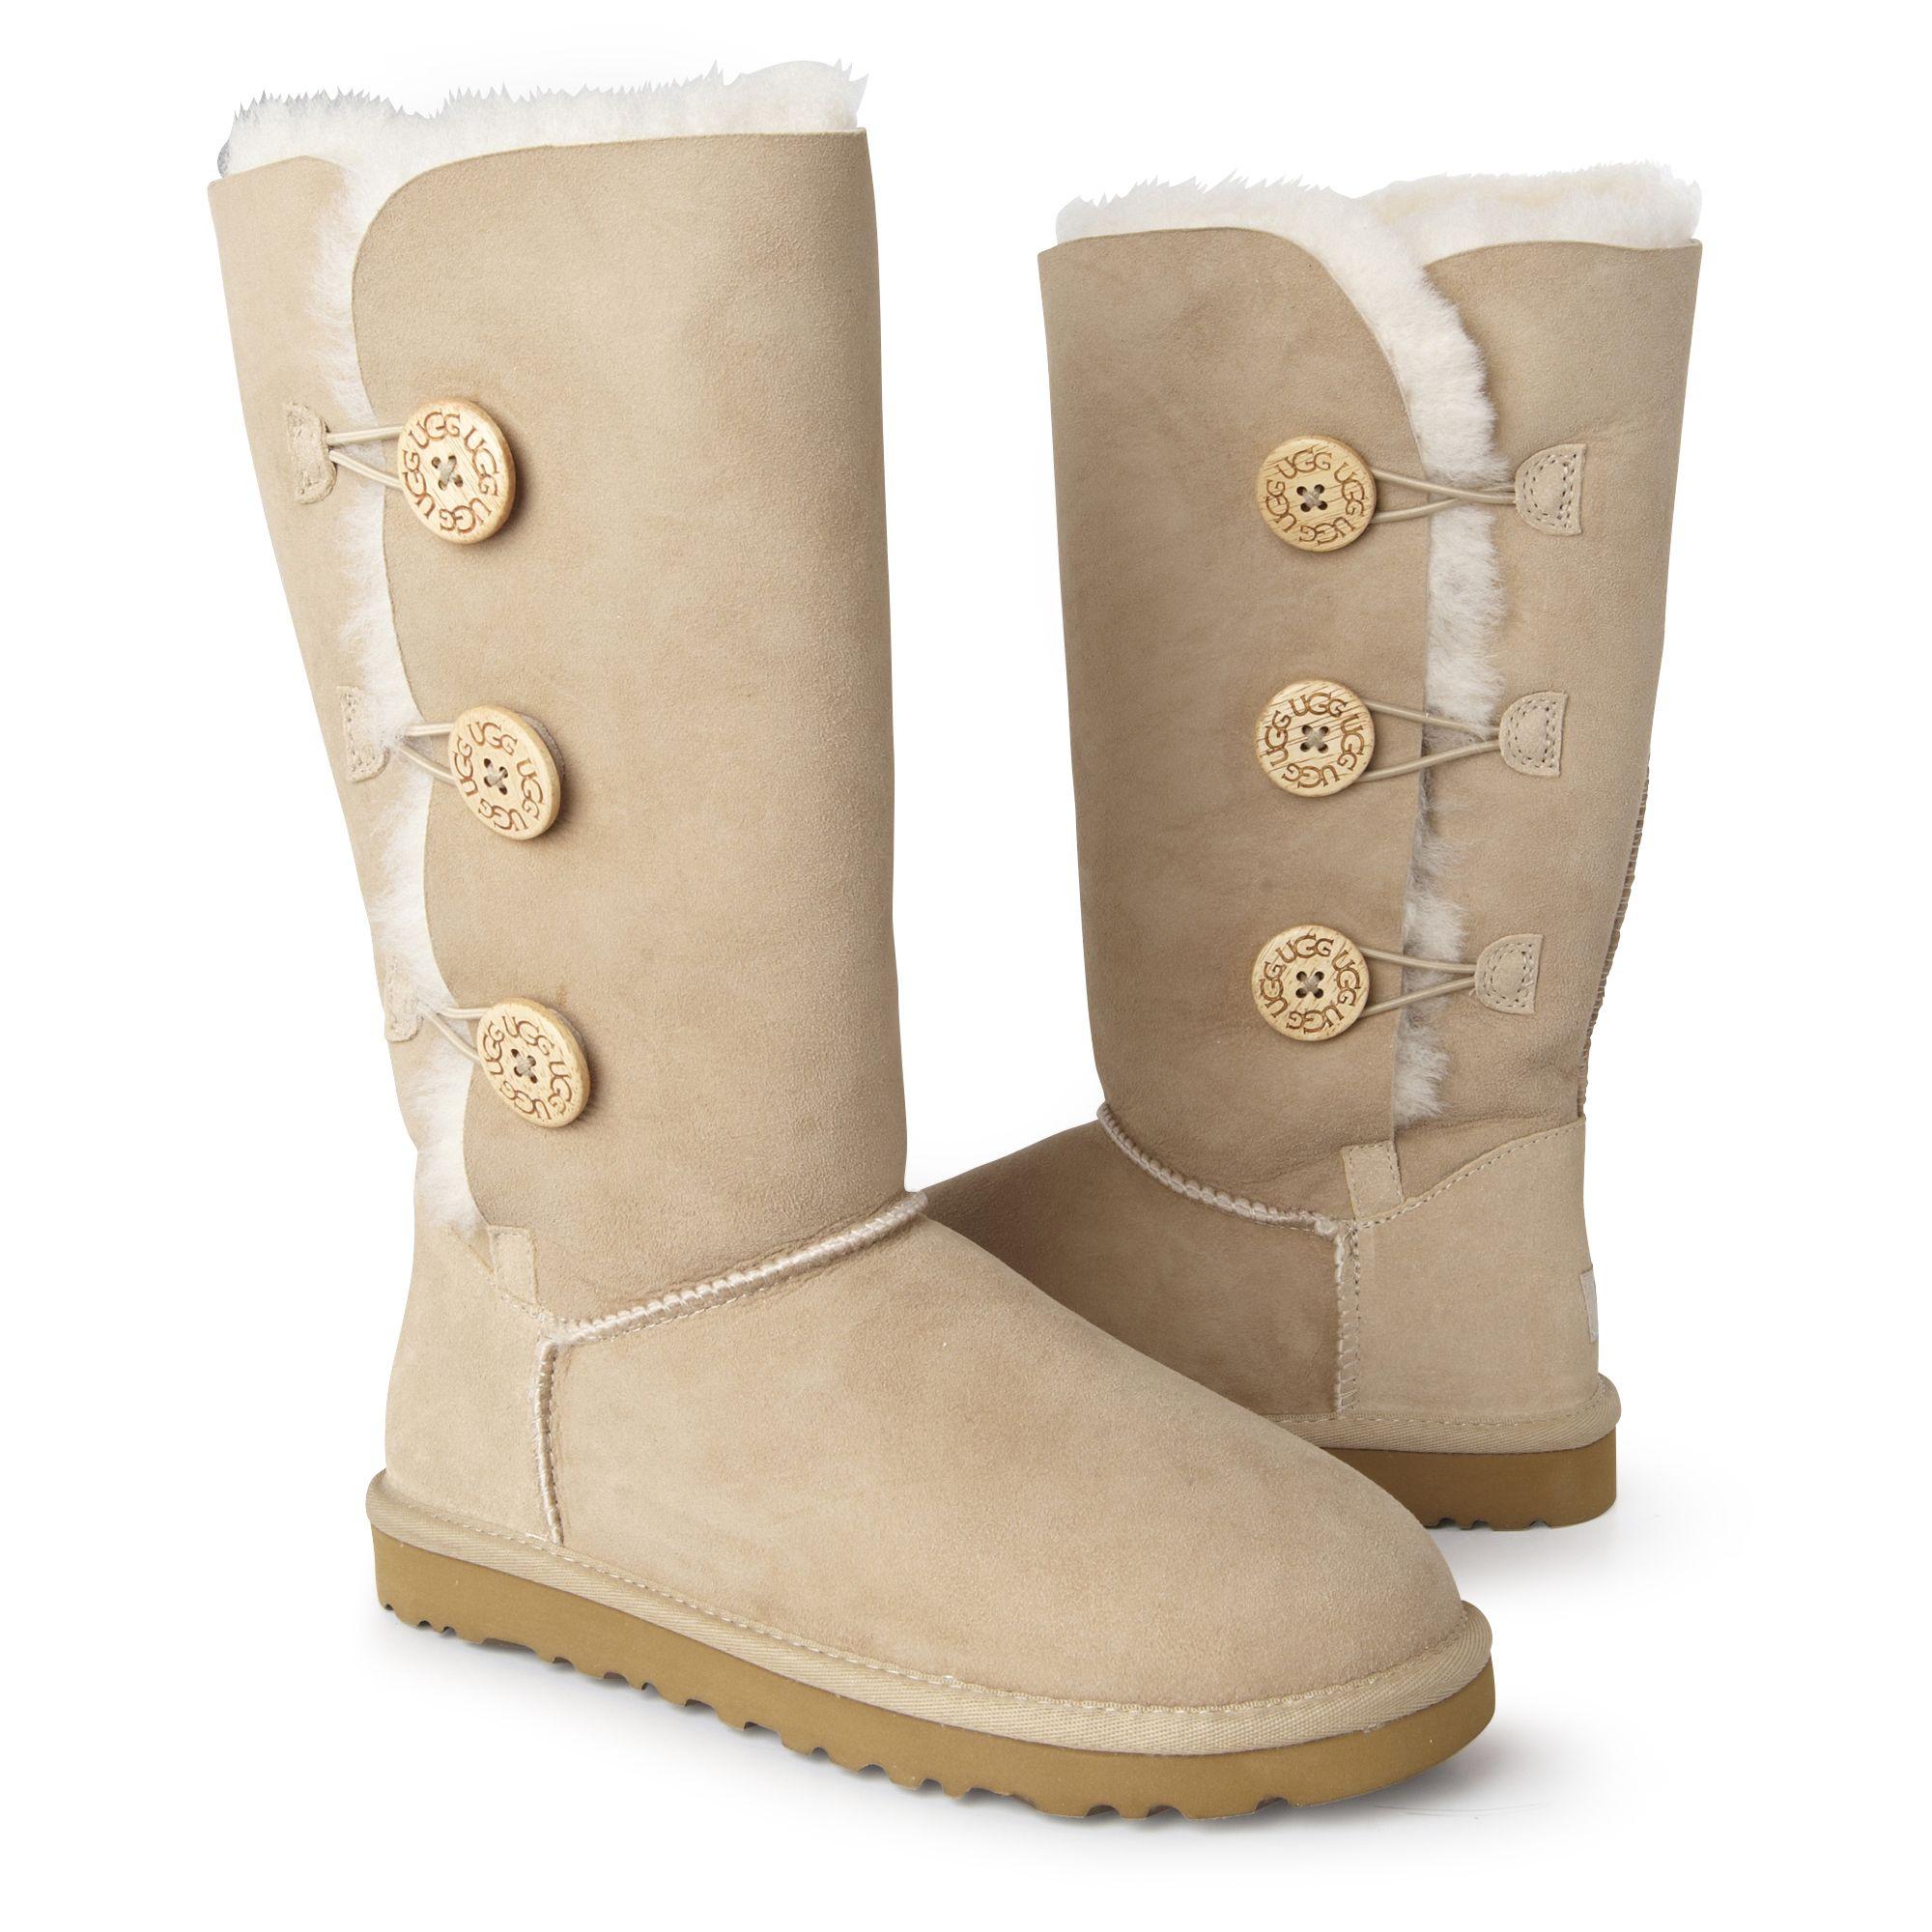 Ugg Boots Light Brown